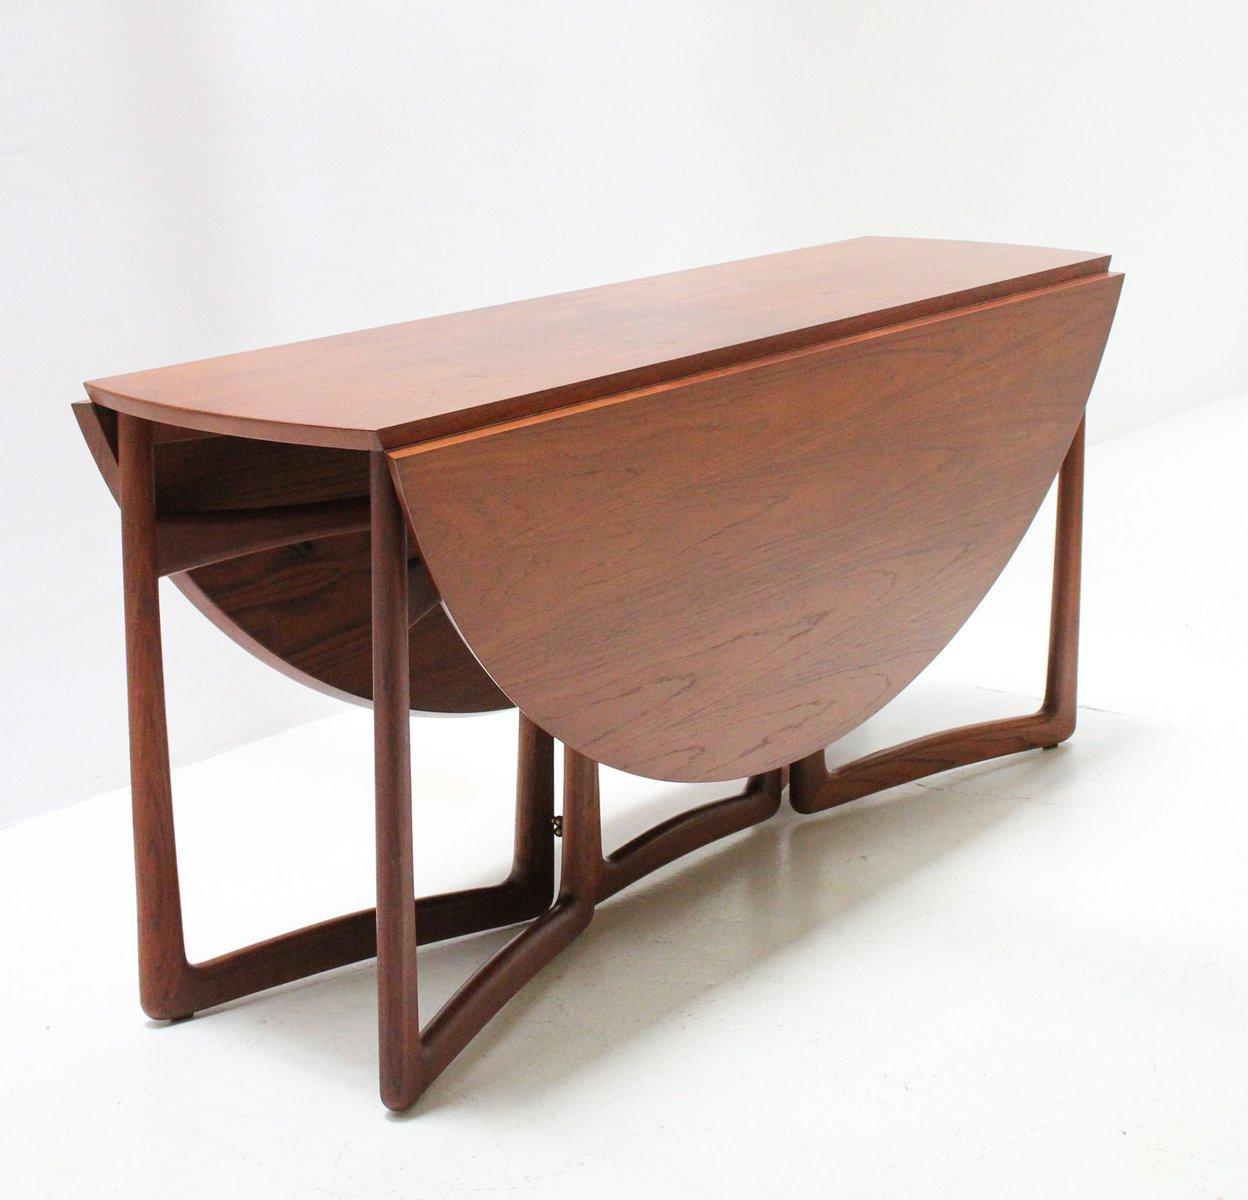 table console rabattable table de runion ebba rabattable with table console rabattable. Black Bedroom Furniture Sets. Home Design Ideas